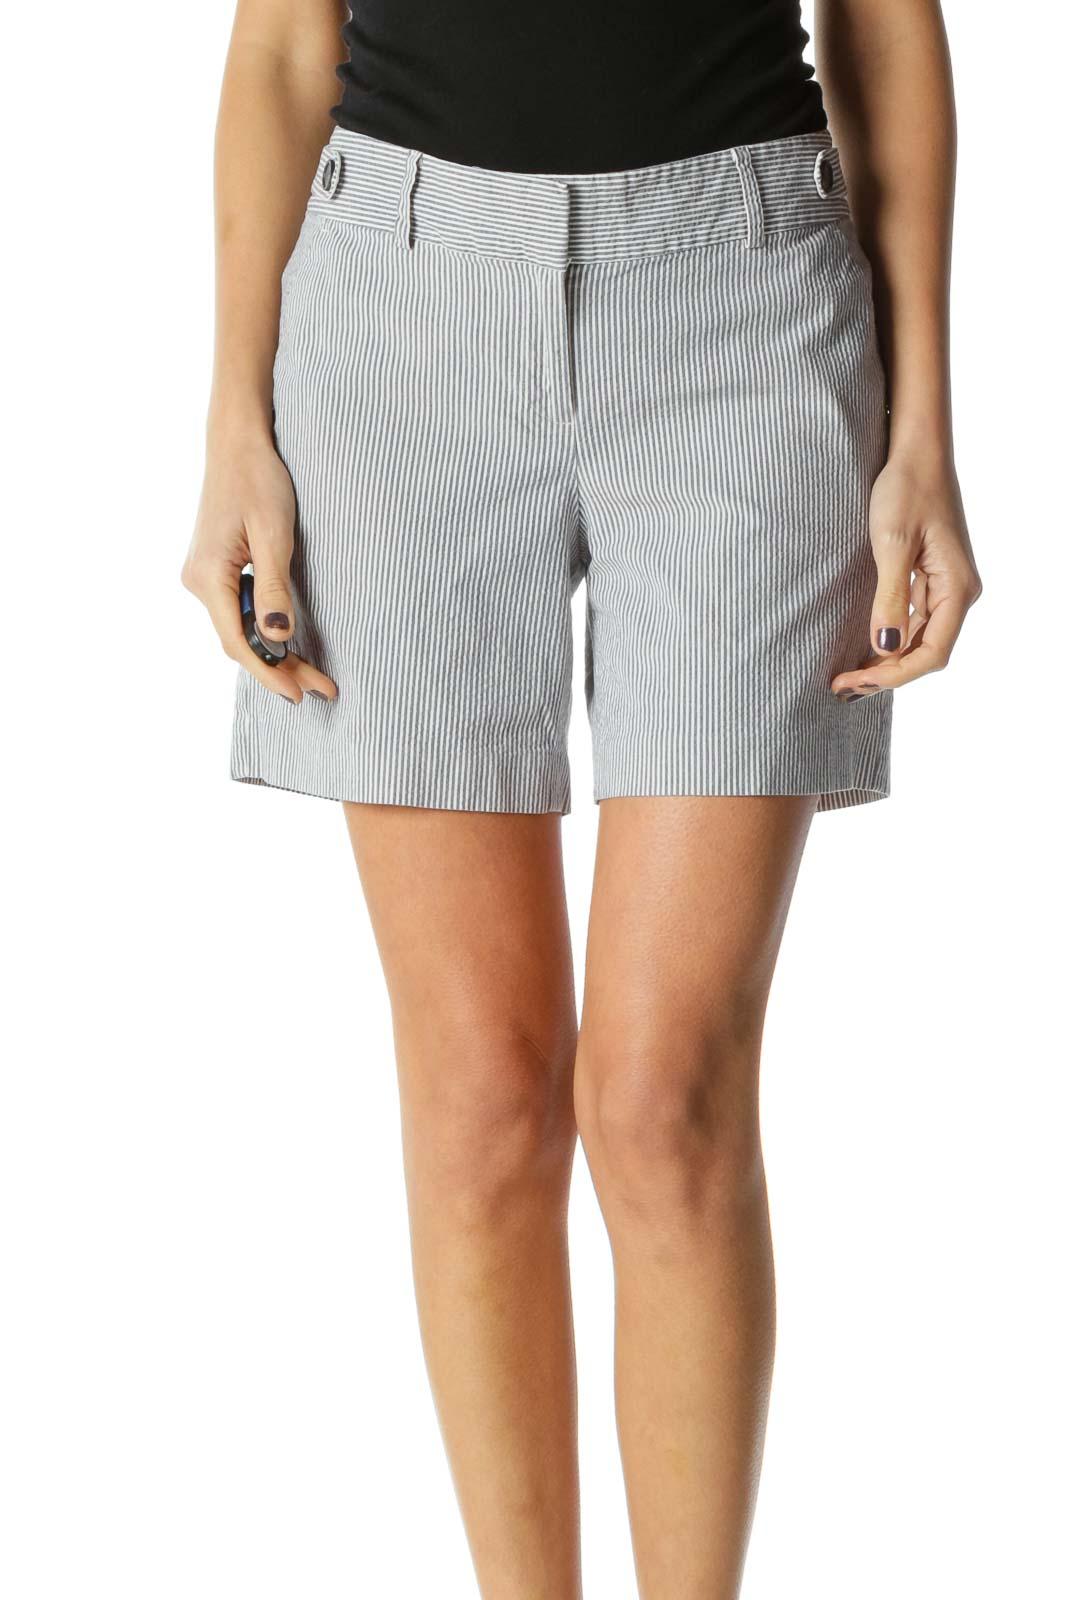 Gray Stripe Chic Shorts